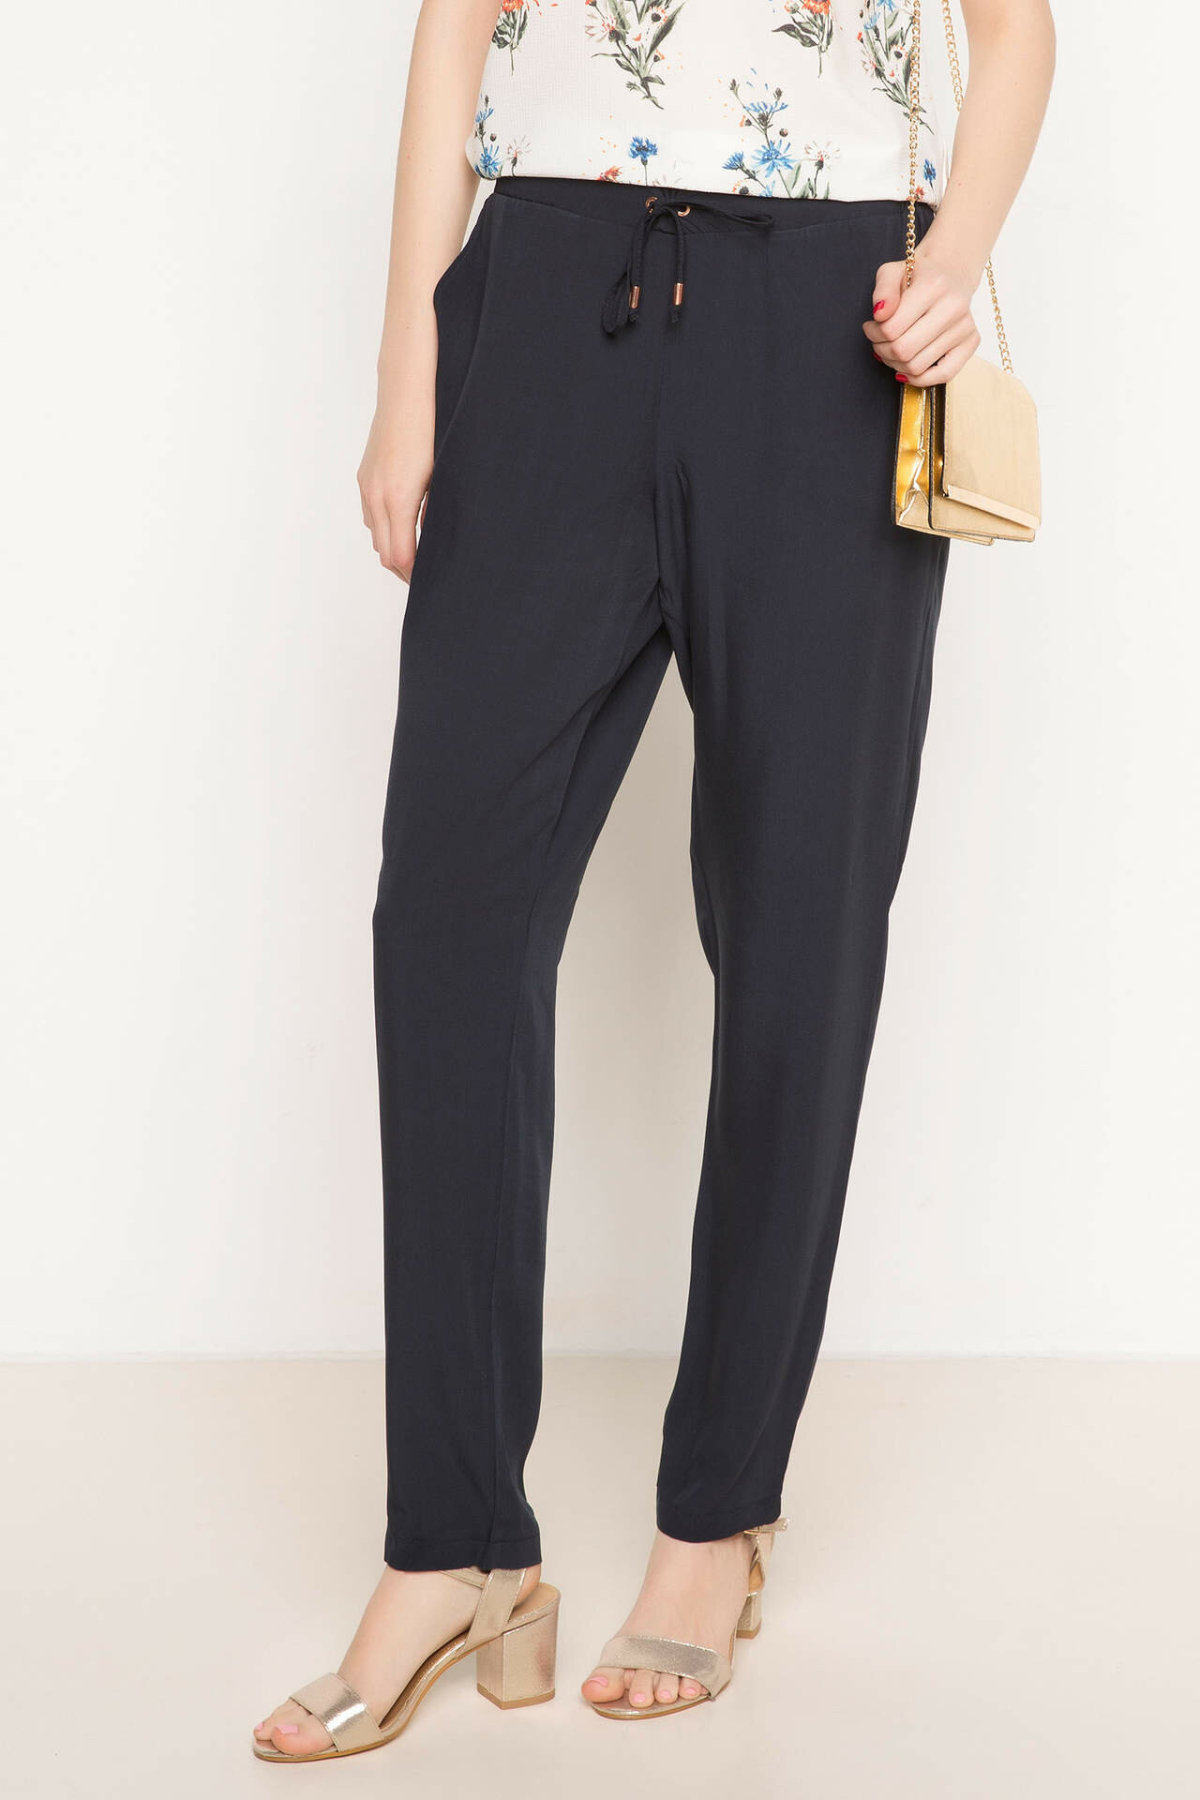 DeFacto Women Black Navy Blue Casual Trousers Spring Fall Adjustable Long Harem Pants 4 Colors Available-G7058AZ17SM